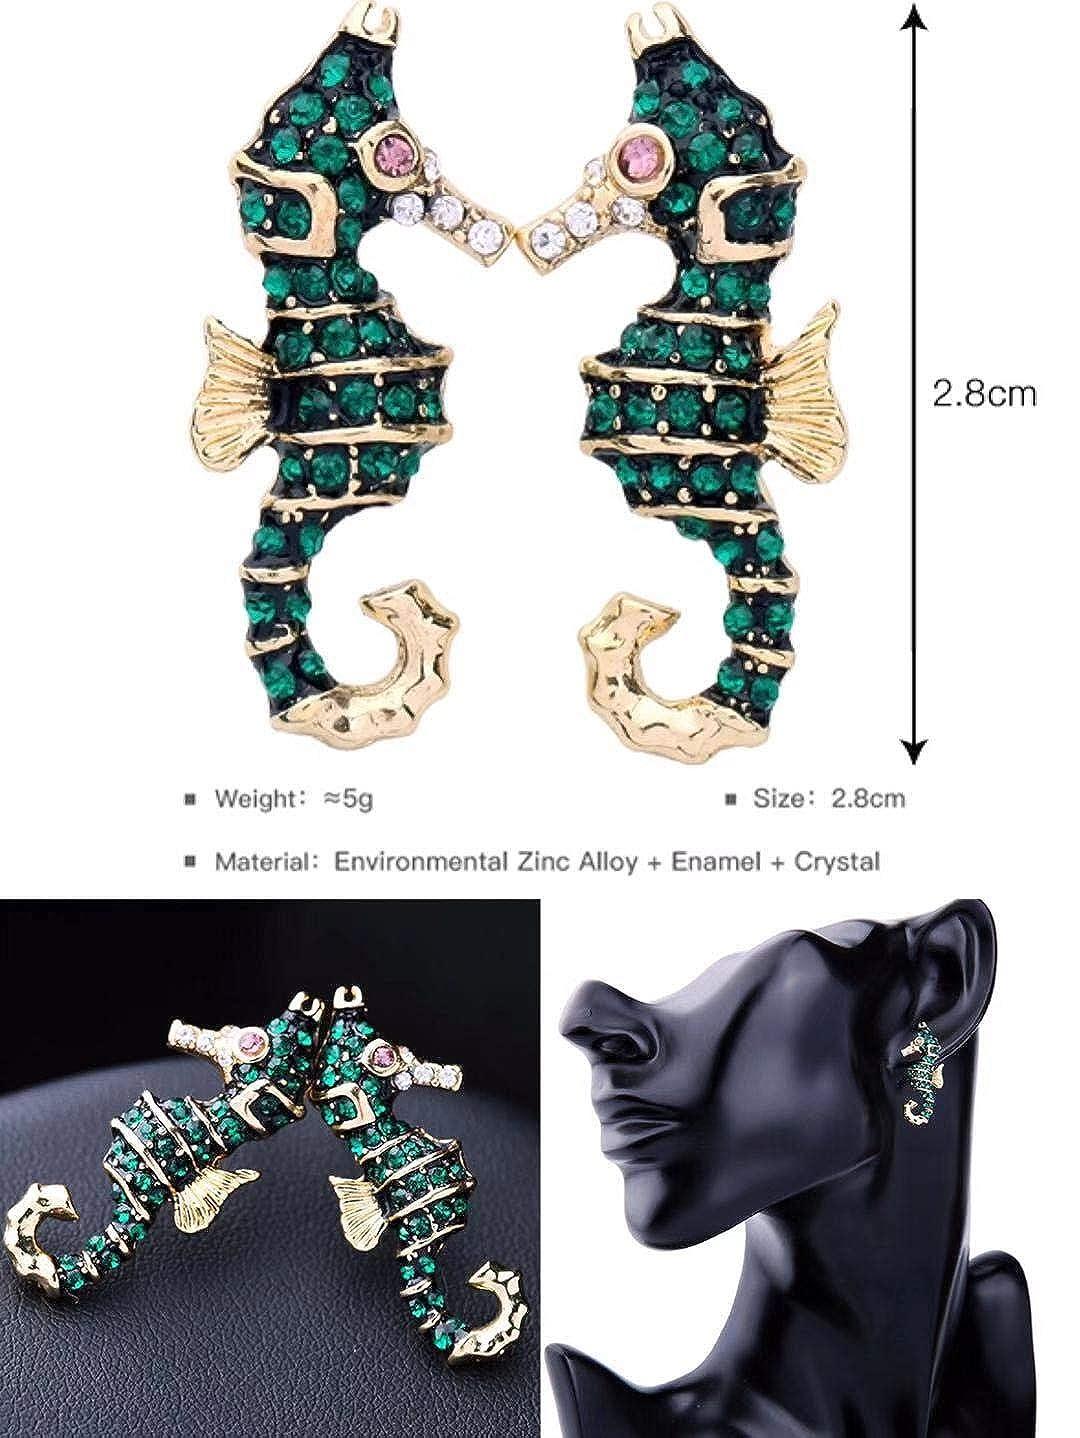 6 Pairs Cute Earrings for Girls Studs Women Earrings sets Fashion Fun Drop Dangle Gift by HappenFashion